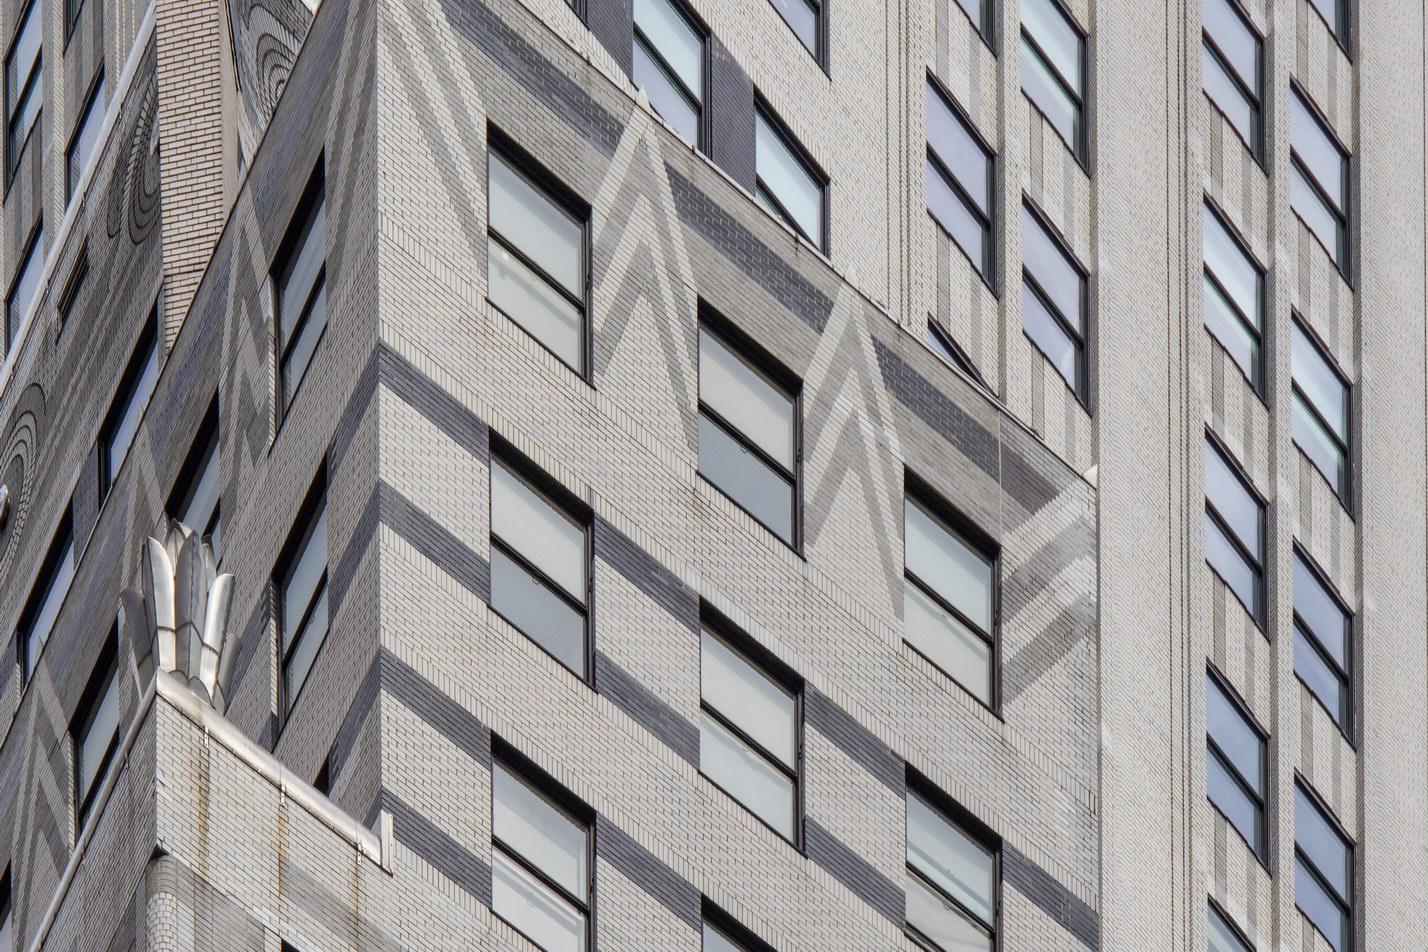 [Chrysler Building] IMG_0087 [8/27/2012 10:46:40 AM]